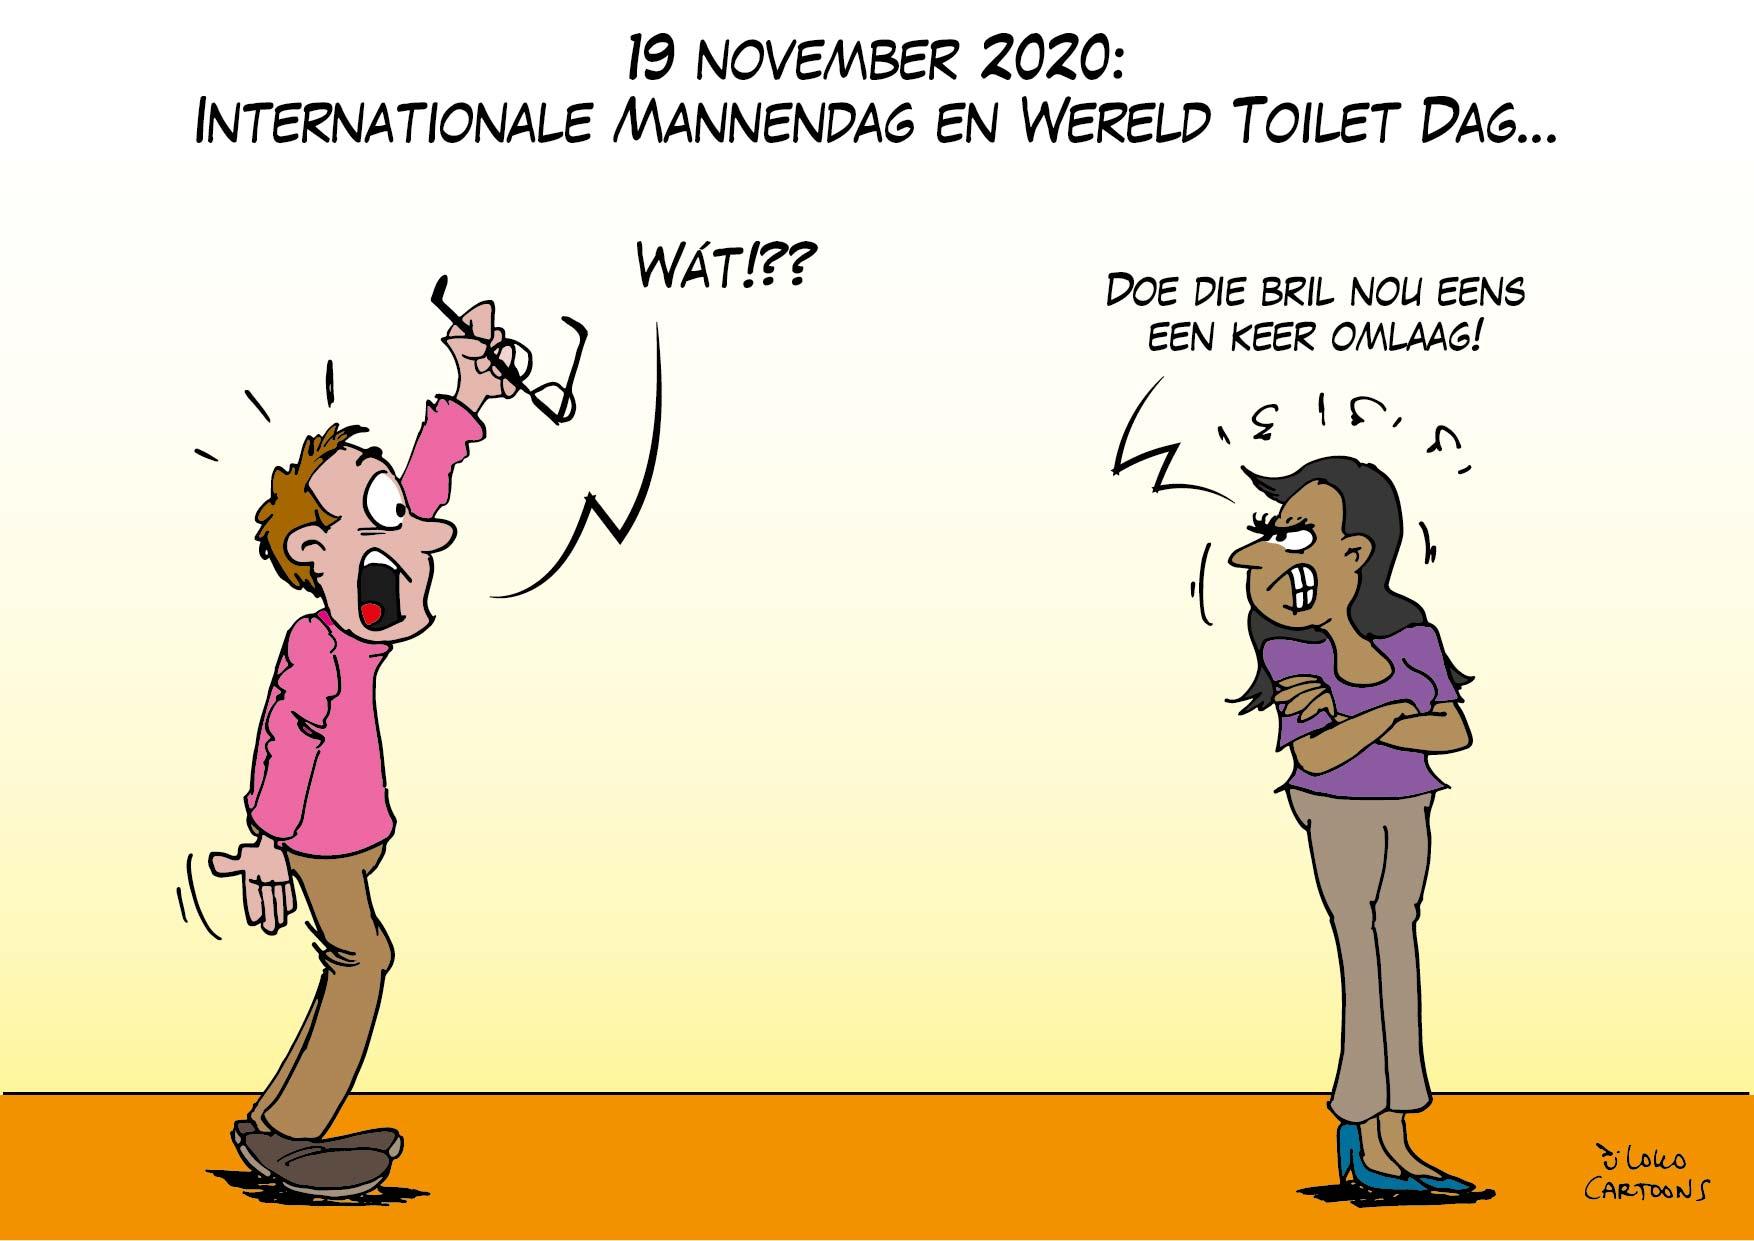 Internationale Mannendag en Wereld Toilet Dag…